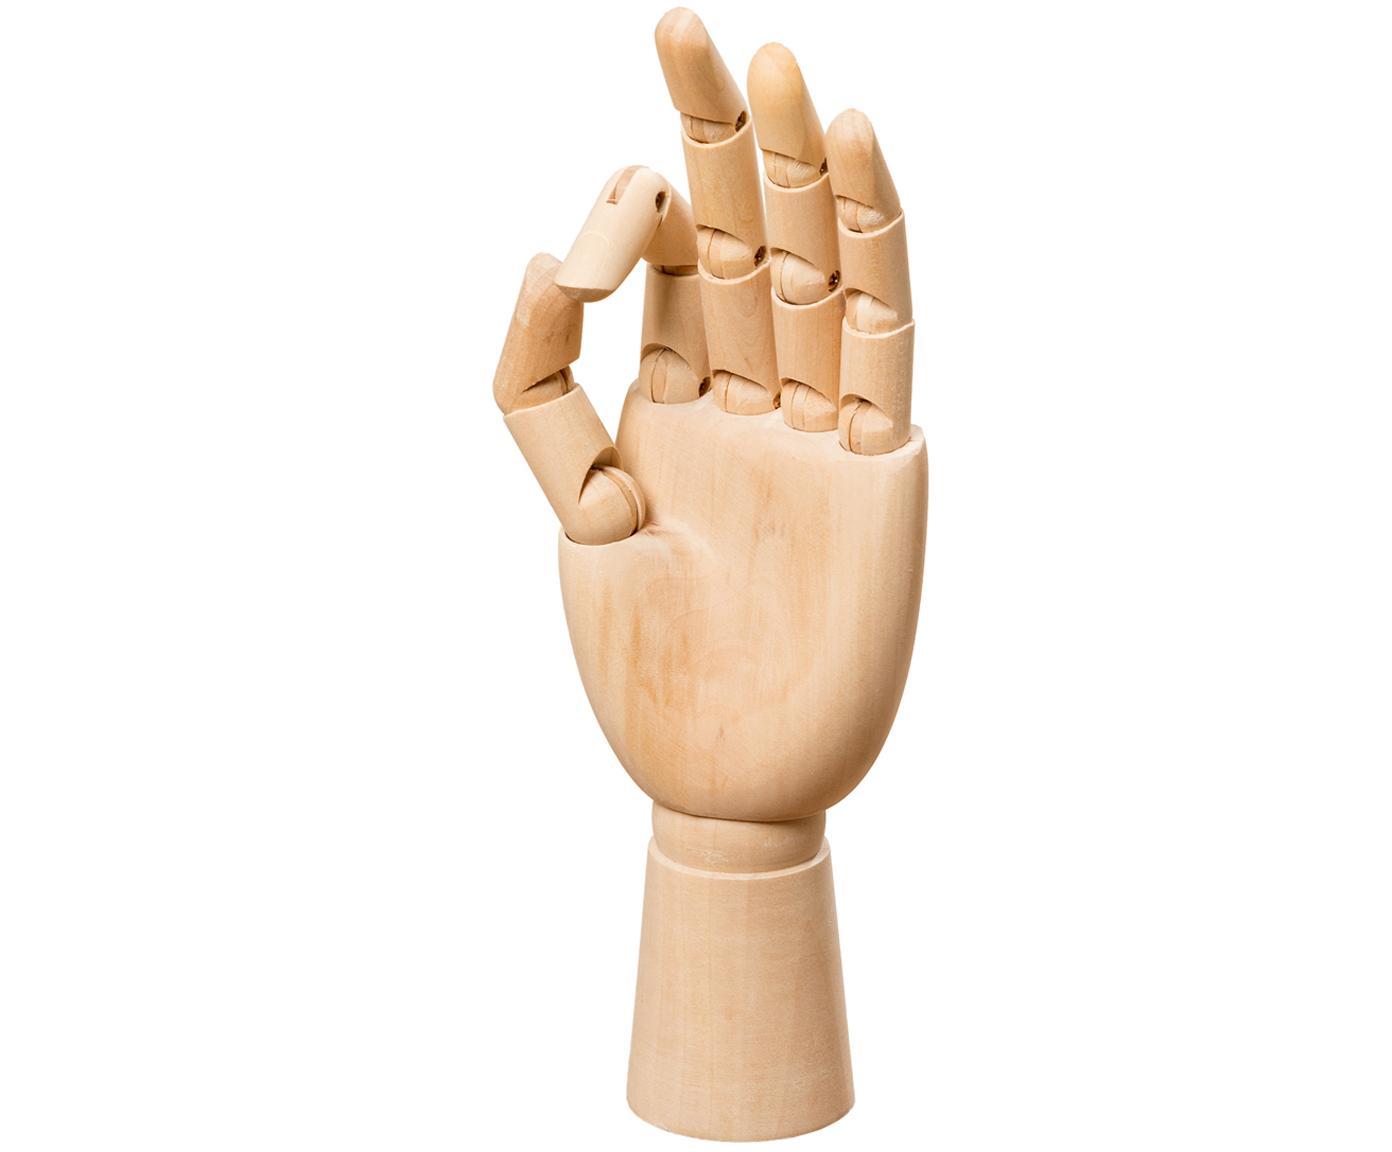 Deko-Objekt Hand, Grasbaum, Hellbraun, 7 x 25 cm